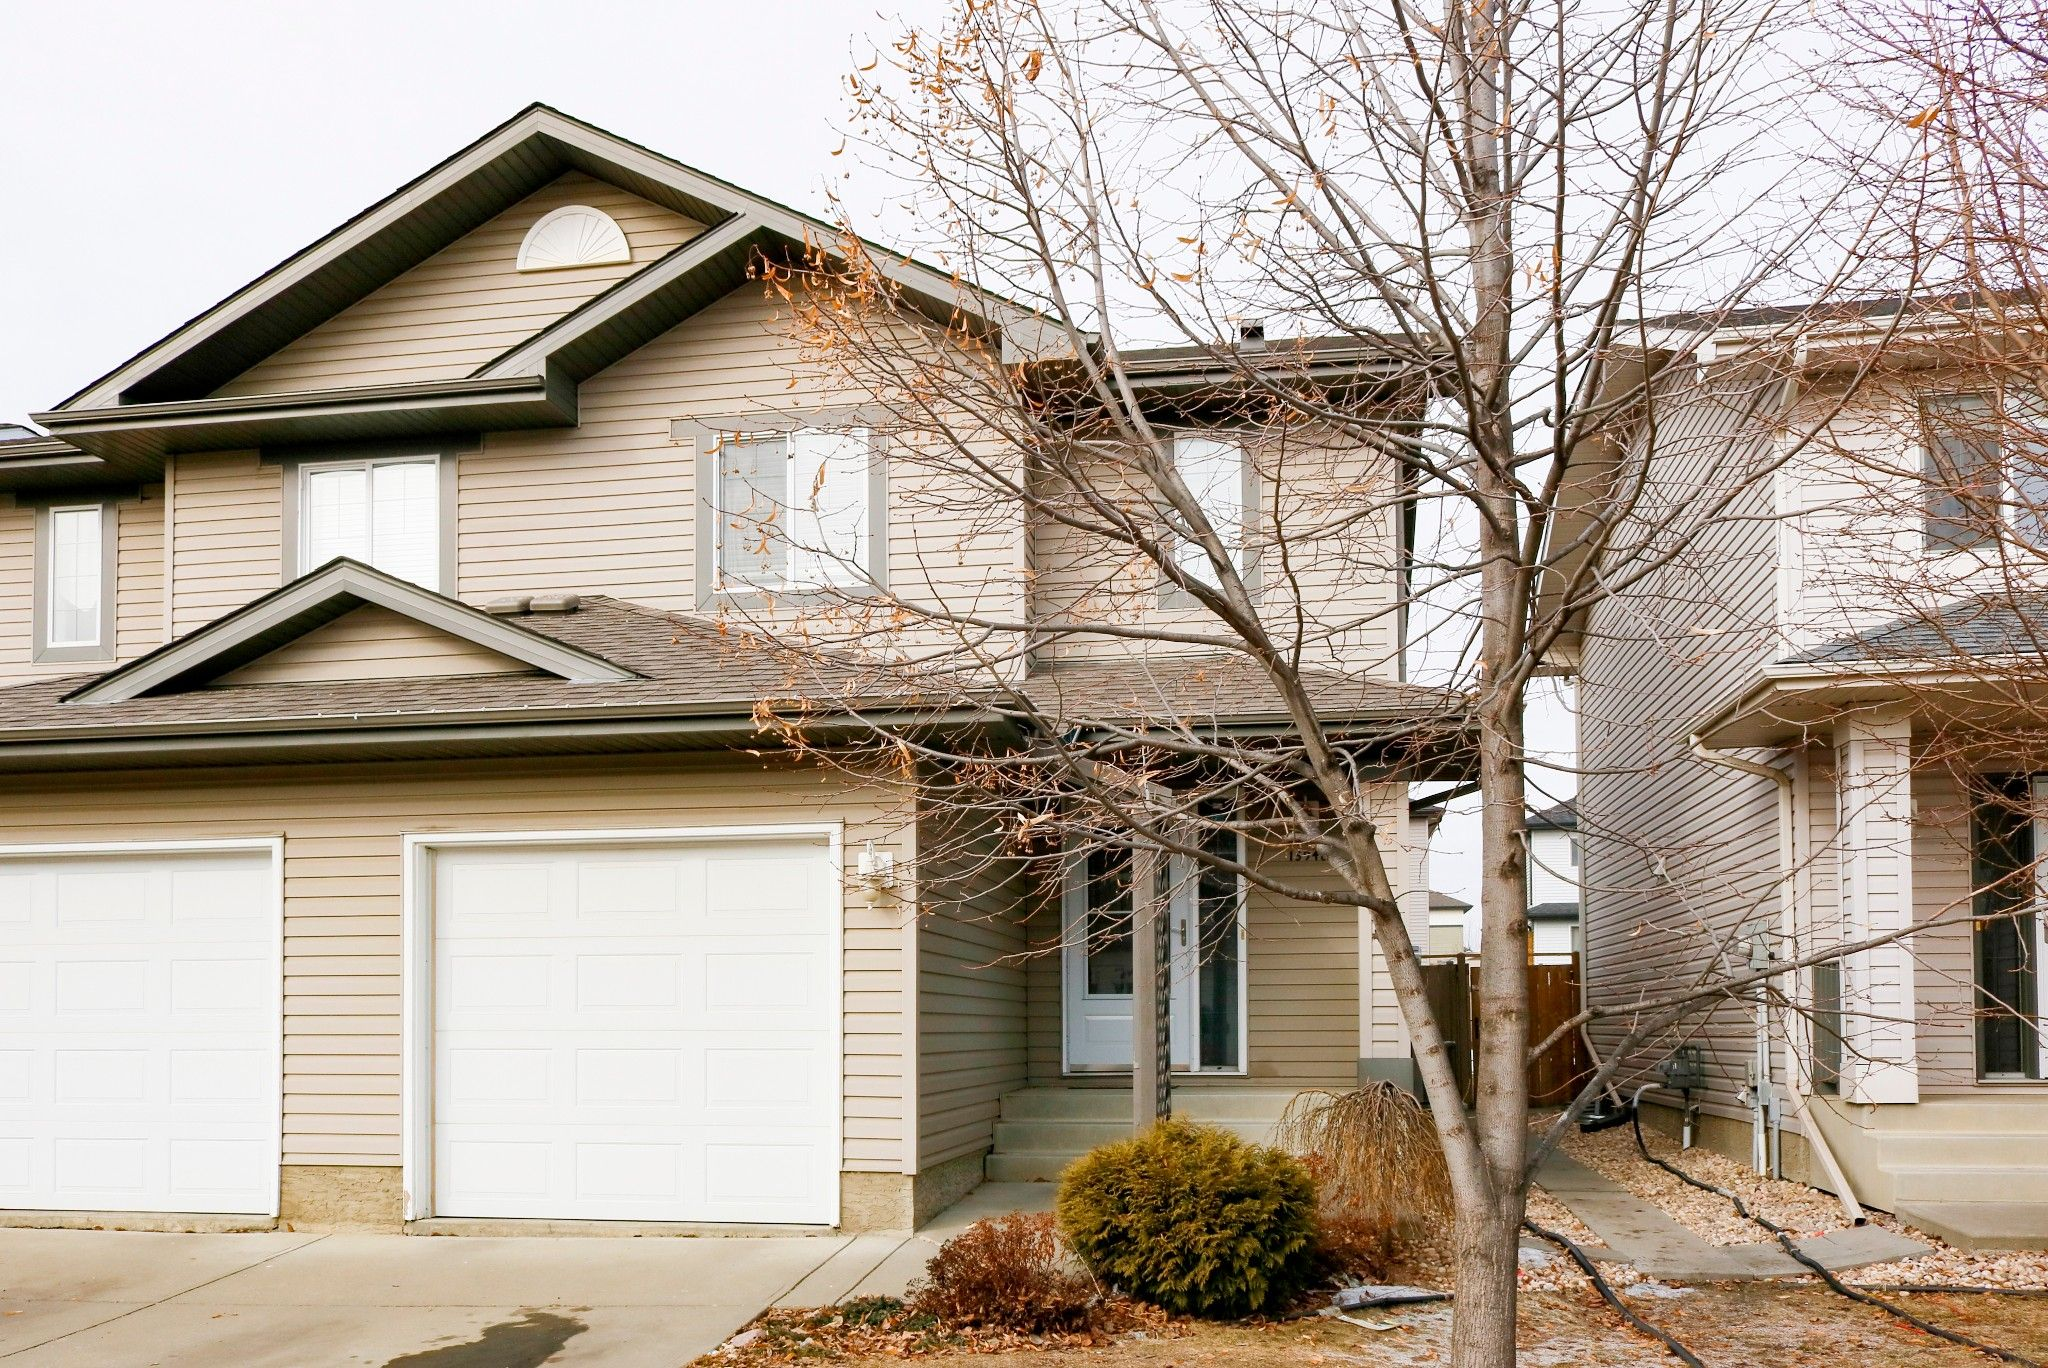 Main Photo: 13948 137 St in Edmonton: House Half Duplex for sale : MLS®# E4235358